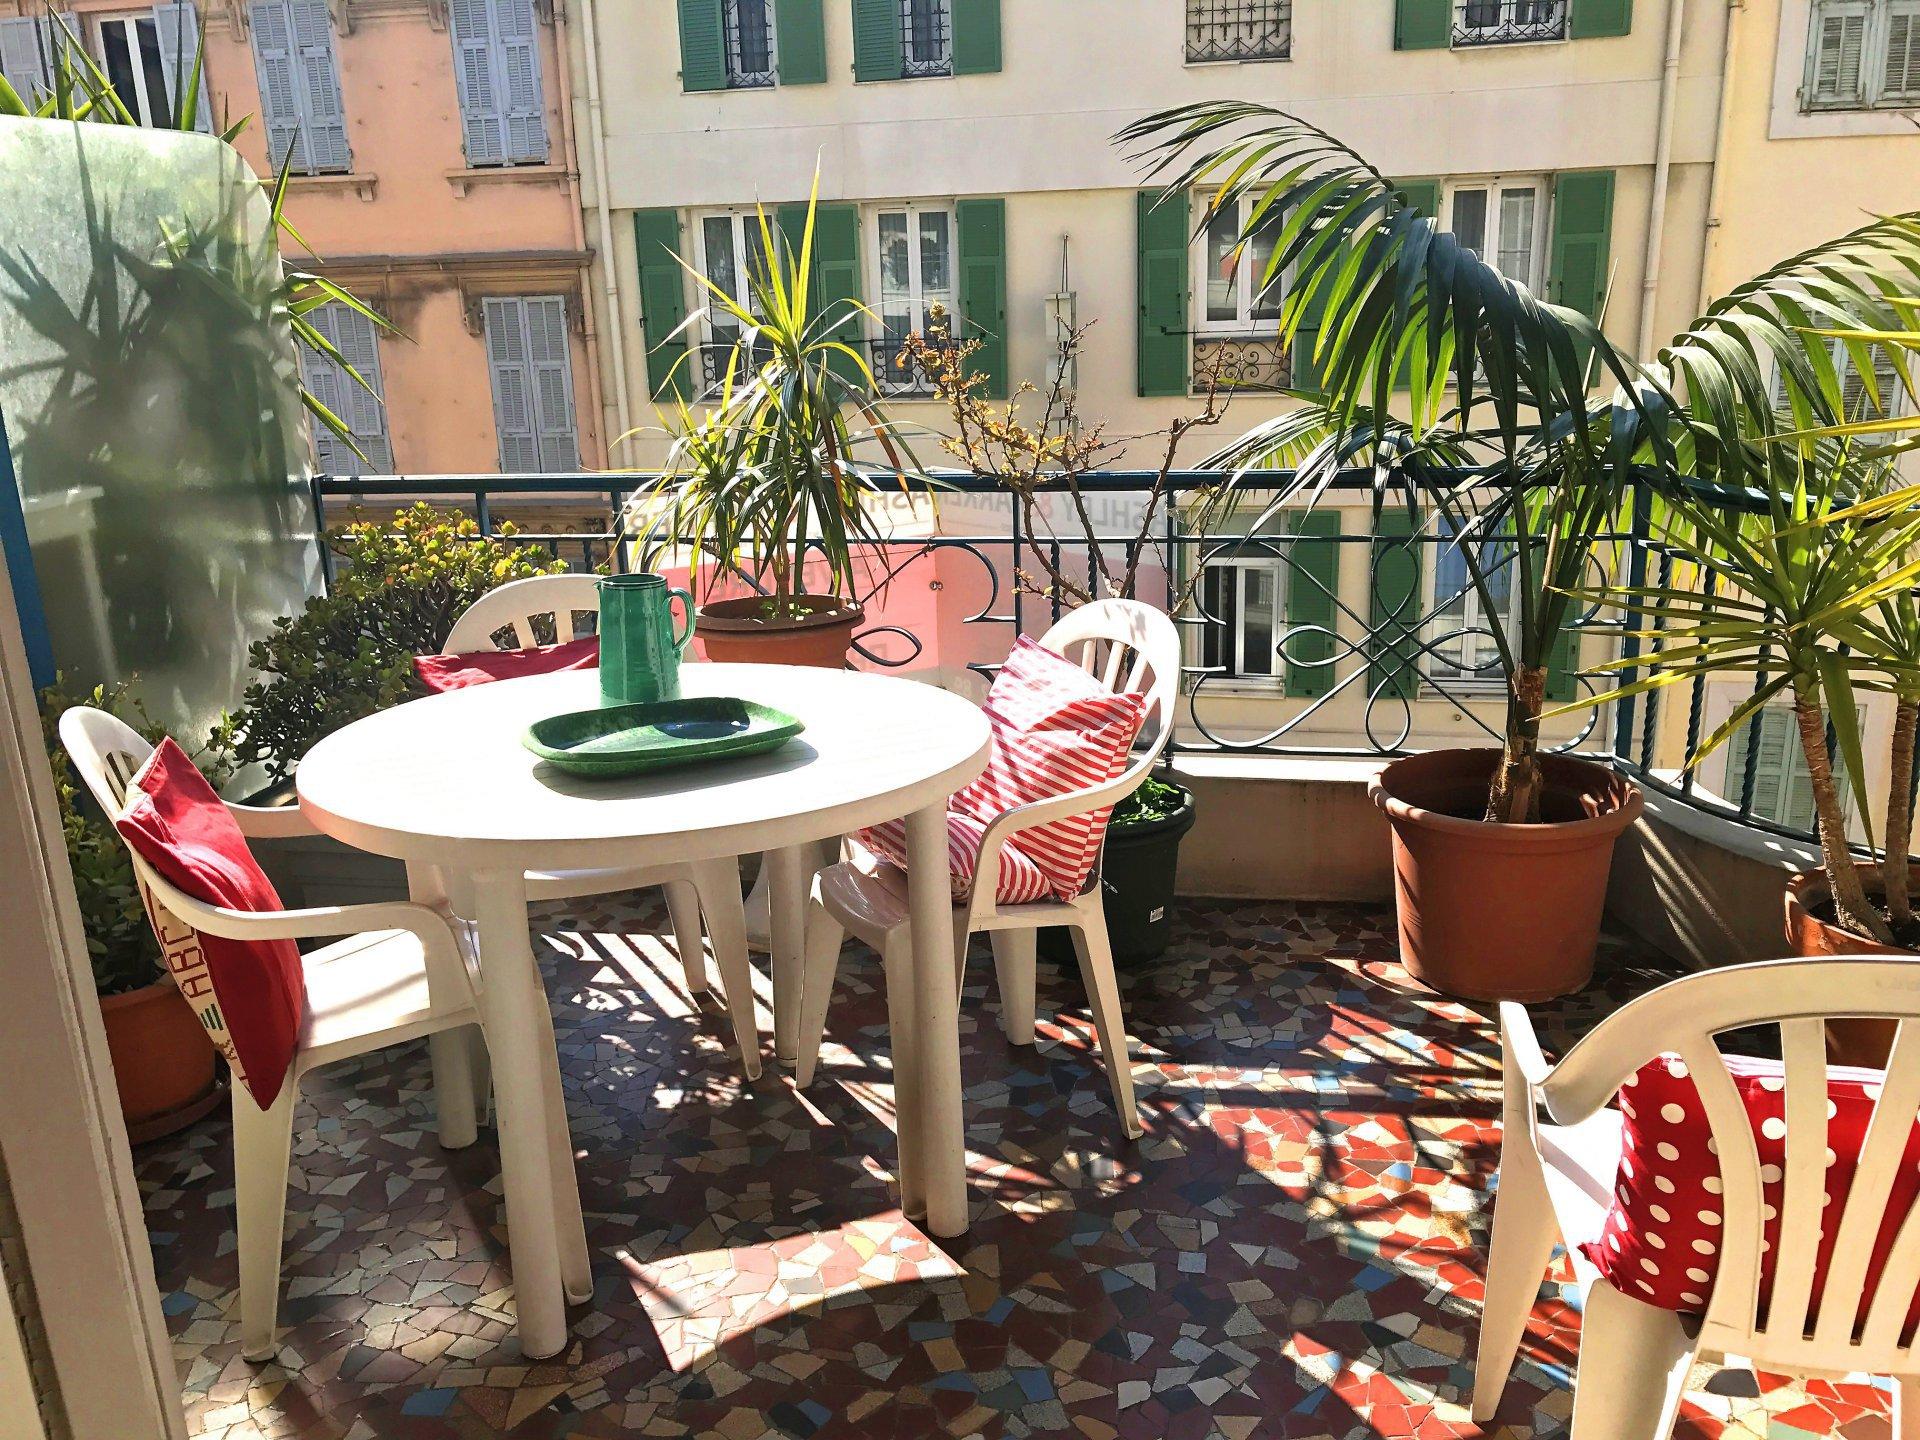 3 Bedrooms apartement Golden Square